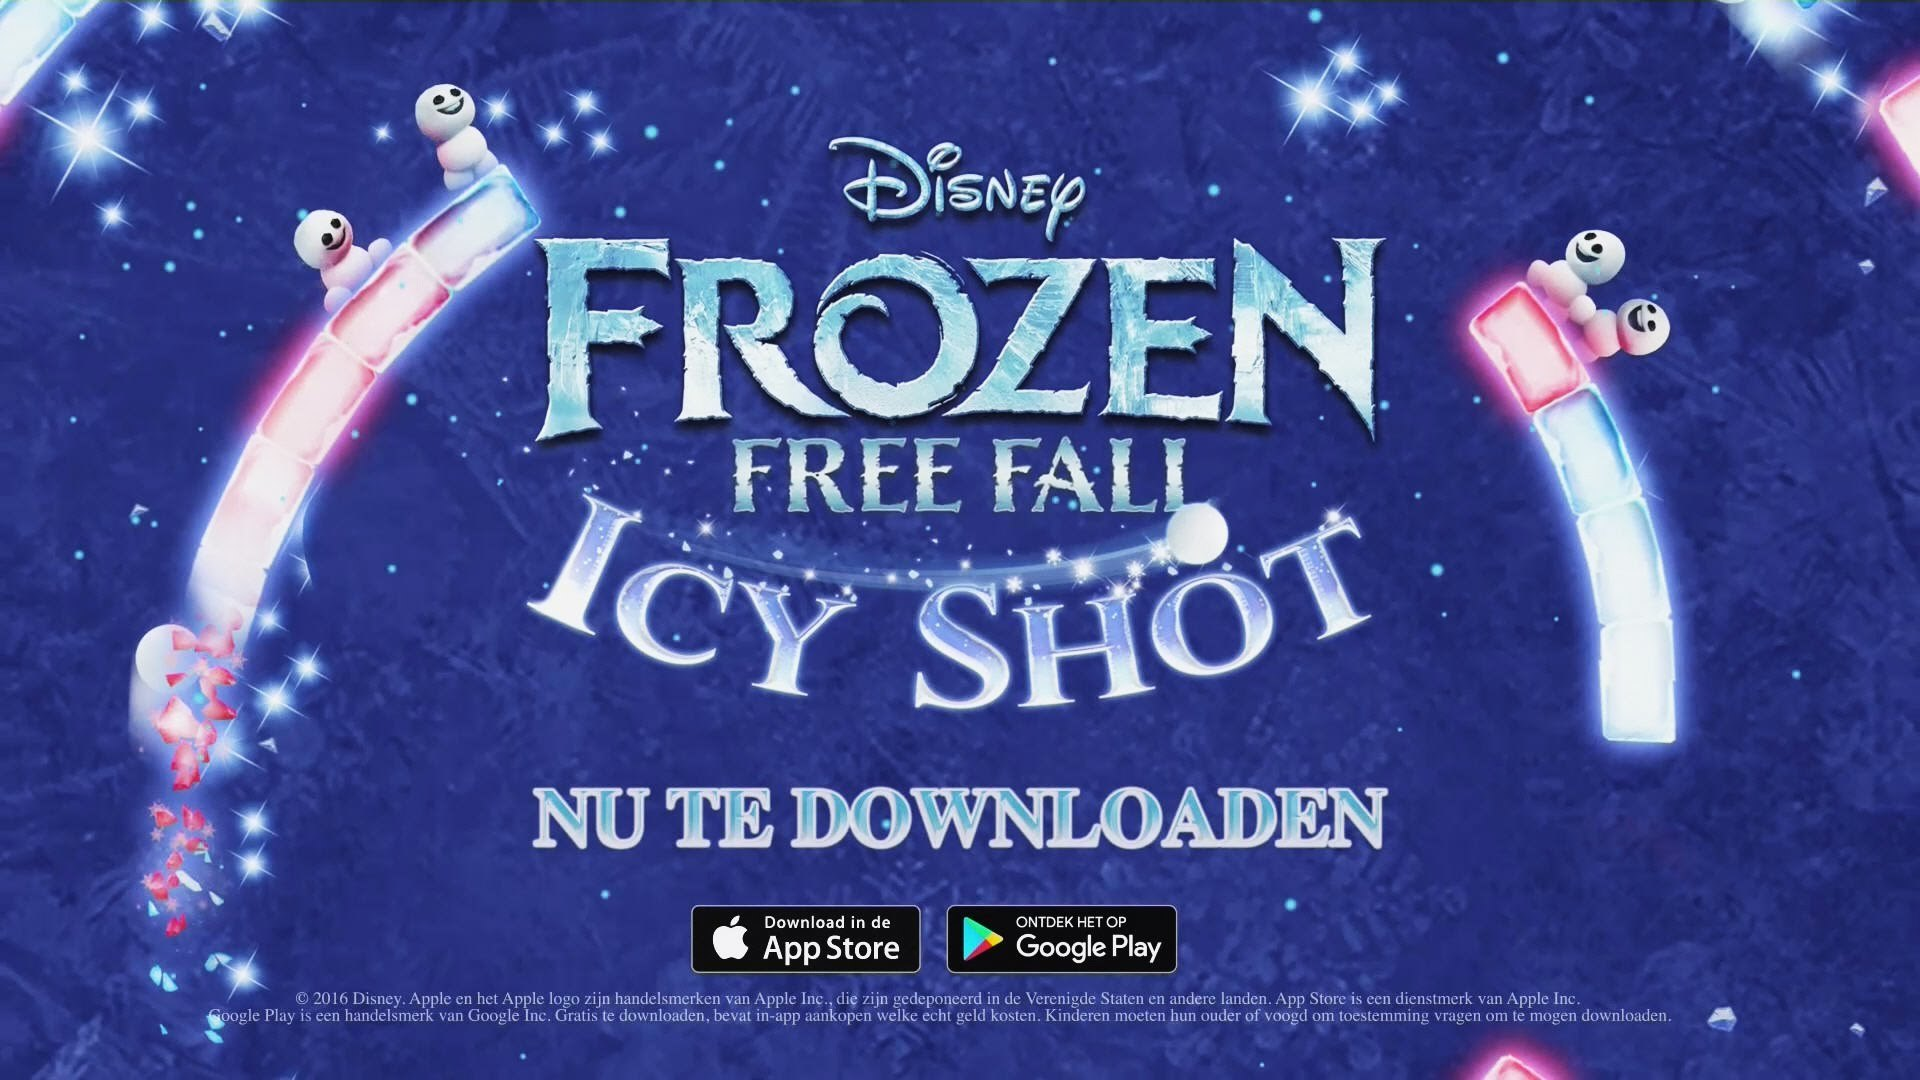 Frozen Free Fall: Icy Shot App Trailer